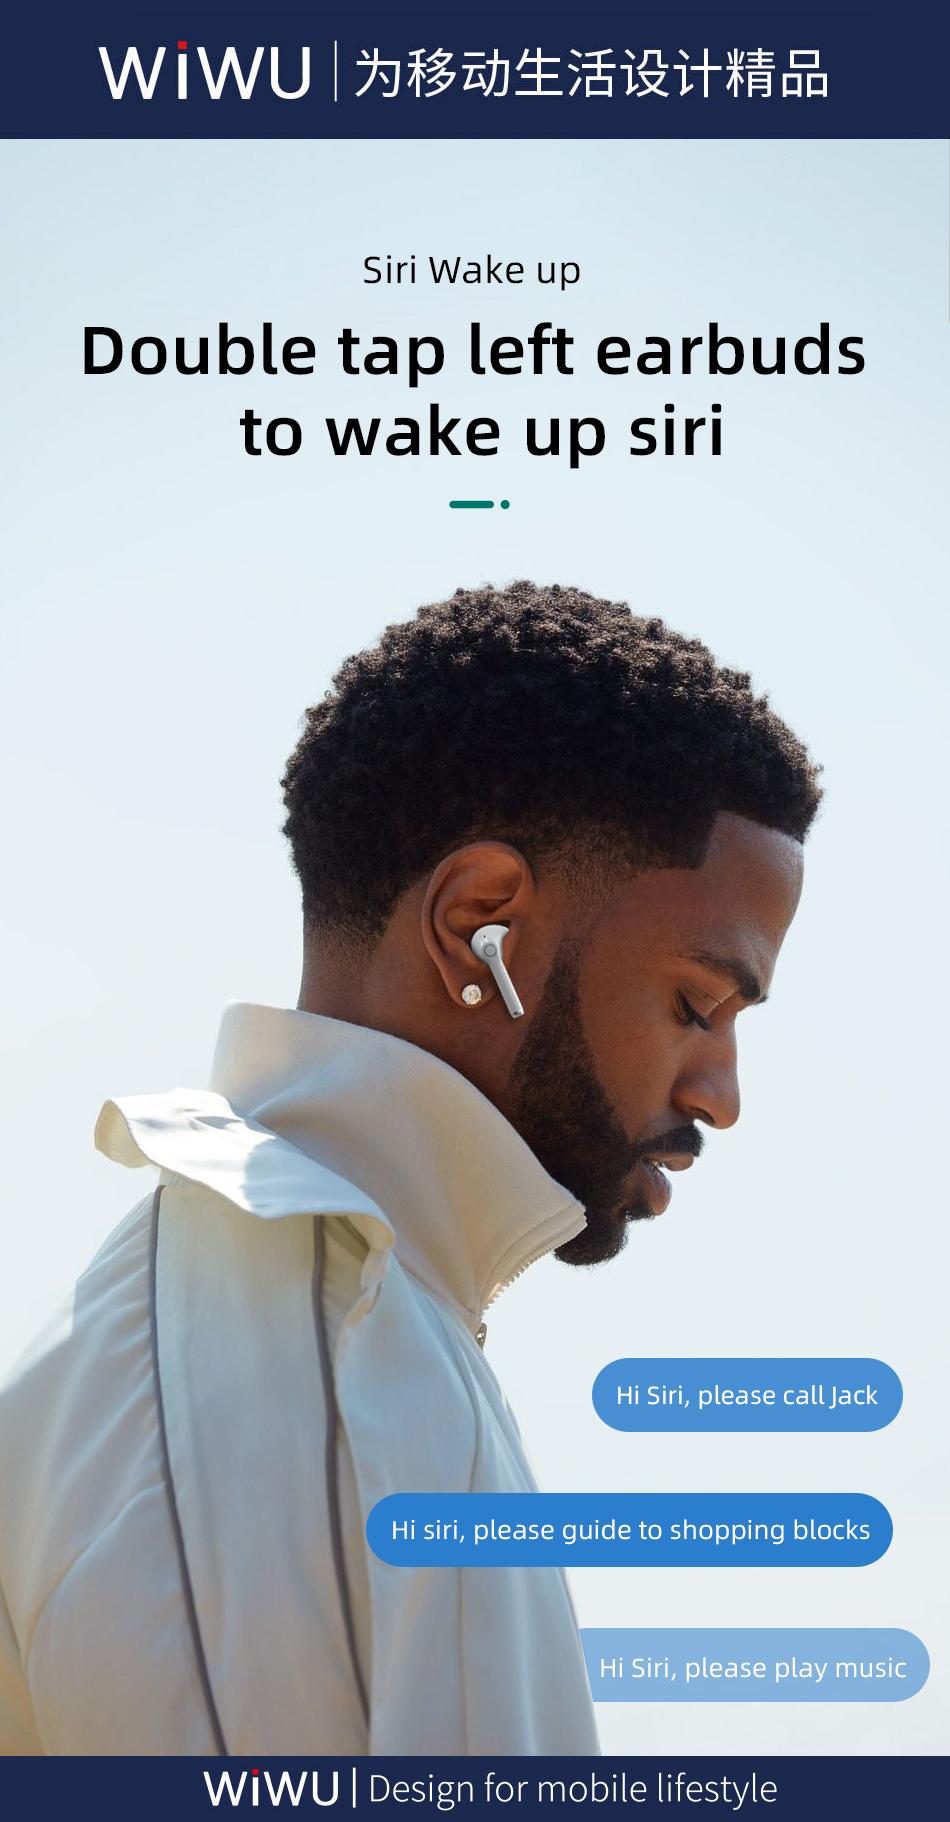 WiWU TWS06真无线双耳 蓝牙耳机 (https://www.wiwu.net.cn/) 耳机 第7张